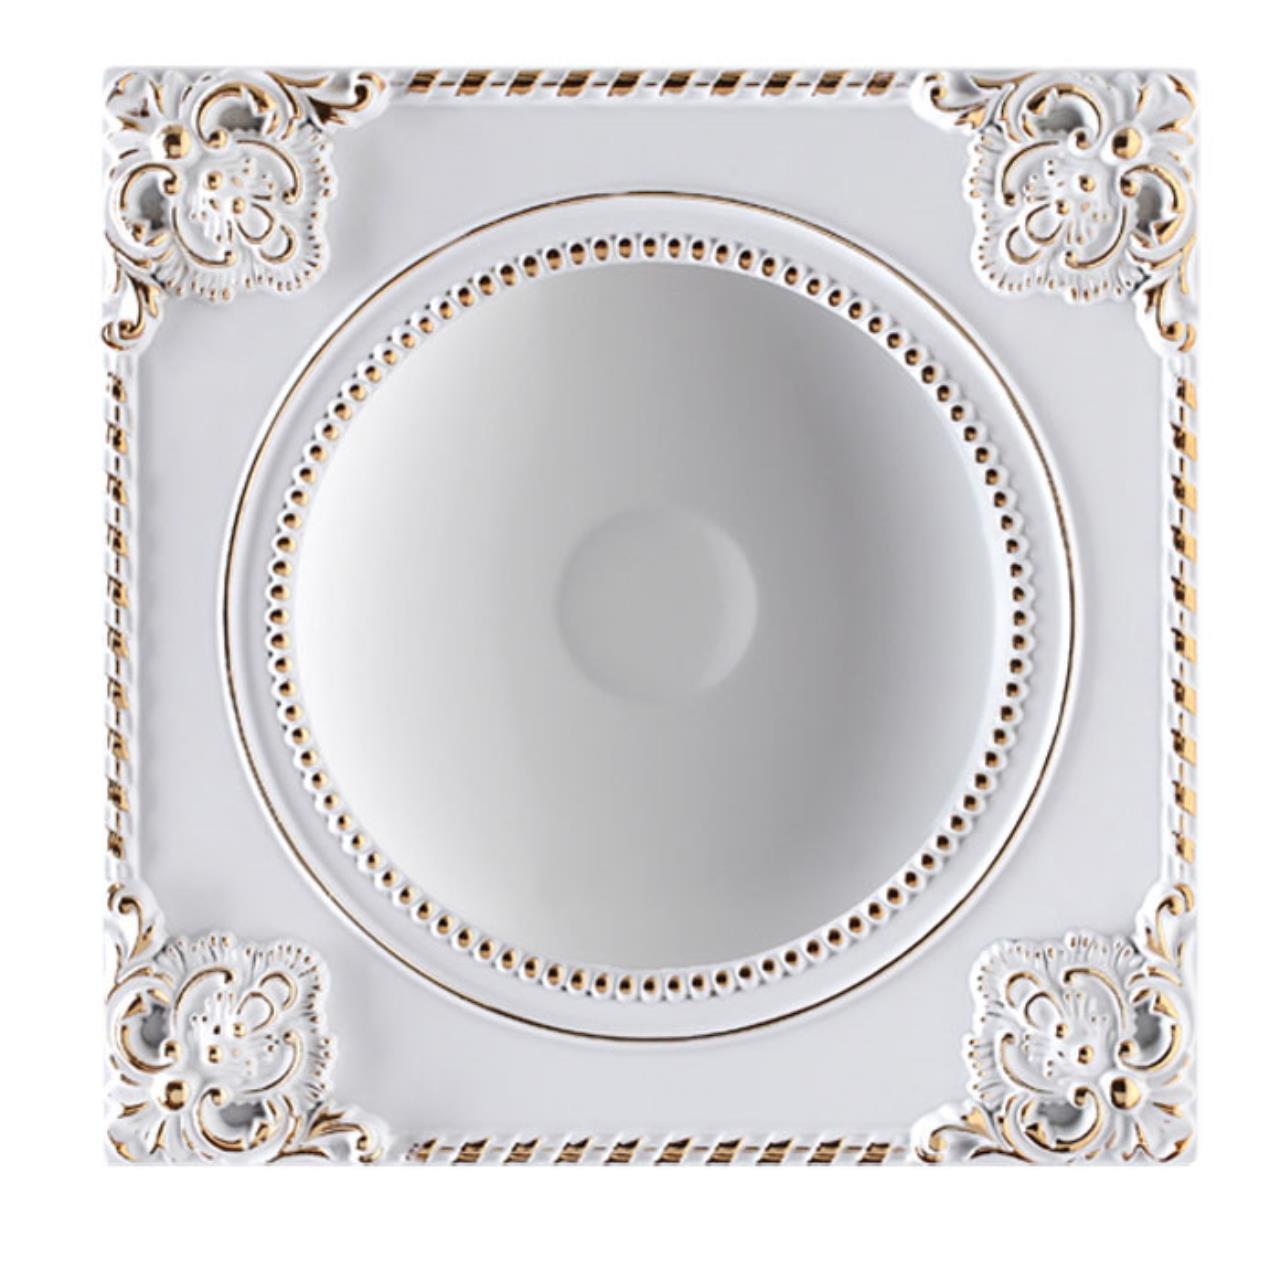 357616 SPOT NT18 141 белый/золото Встраиваемый светильник IP20 LED 3000K 18W 85-265V NOVEL